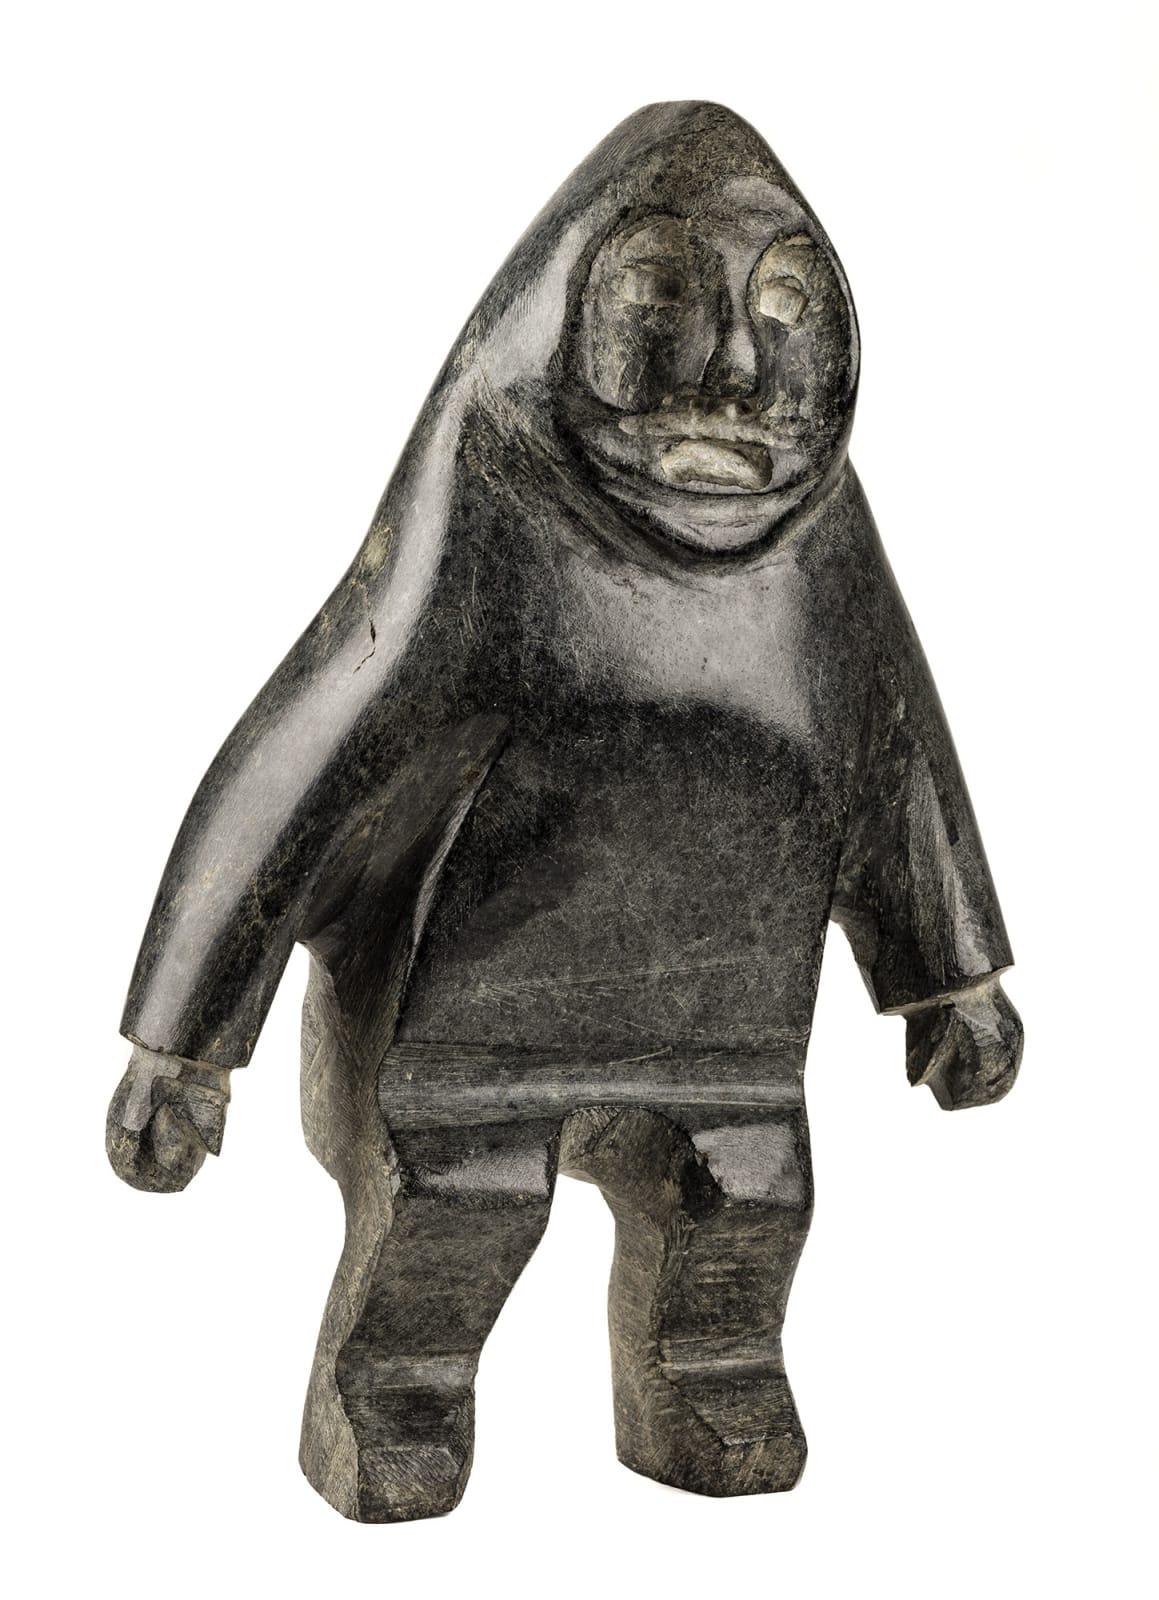 Lot 11 JOHN KAVIK (1897-1993) KANGIQLINIQ (RANKIN INLET) Standing Man, mid-late 1960s stone, 9.75 x 6.75 x 3.25 in (25 x 17 x 8.5 cm) Estimate: $5,000 — $7,000 Price realized: $4,800